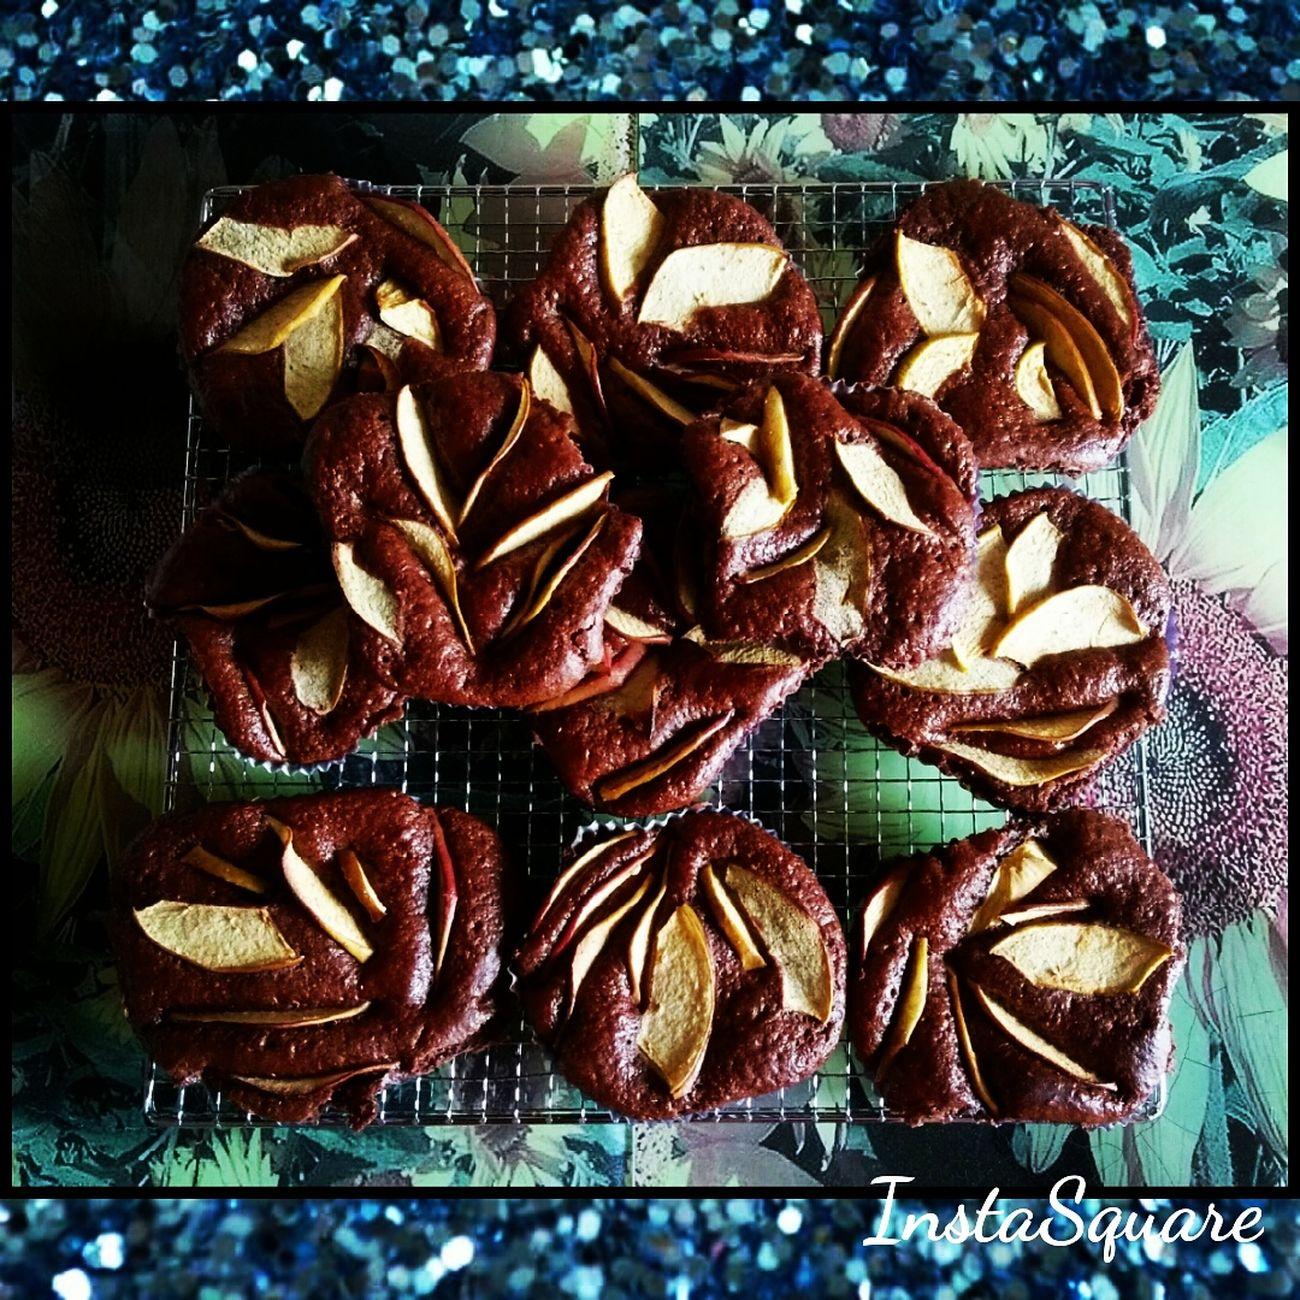 Coffee-Time ☕🌷😍 Coffee ☕ Coffee Time Have A Nice Day♥ Haveaniceweekend Weekend Bakery Chocolate♡ Chococake Chocoaddict Chocoaddicted Bakery Cake Bakery Freaks Bakerylove I❤cakes Applecake Littlecake LittlePieceOfHeaven